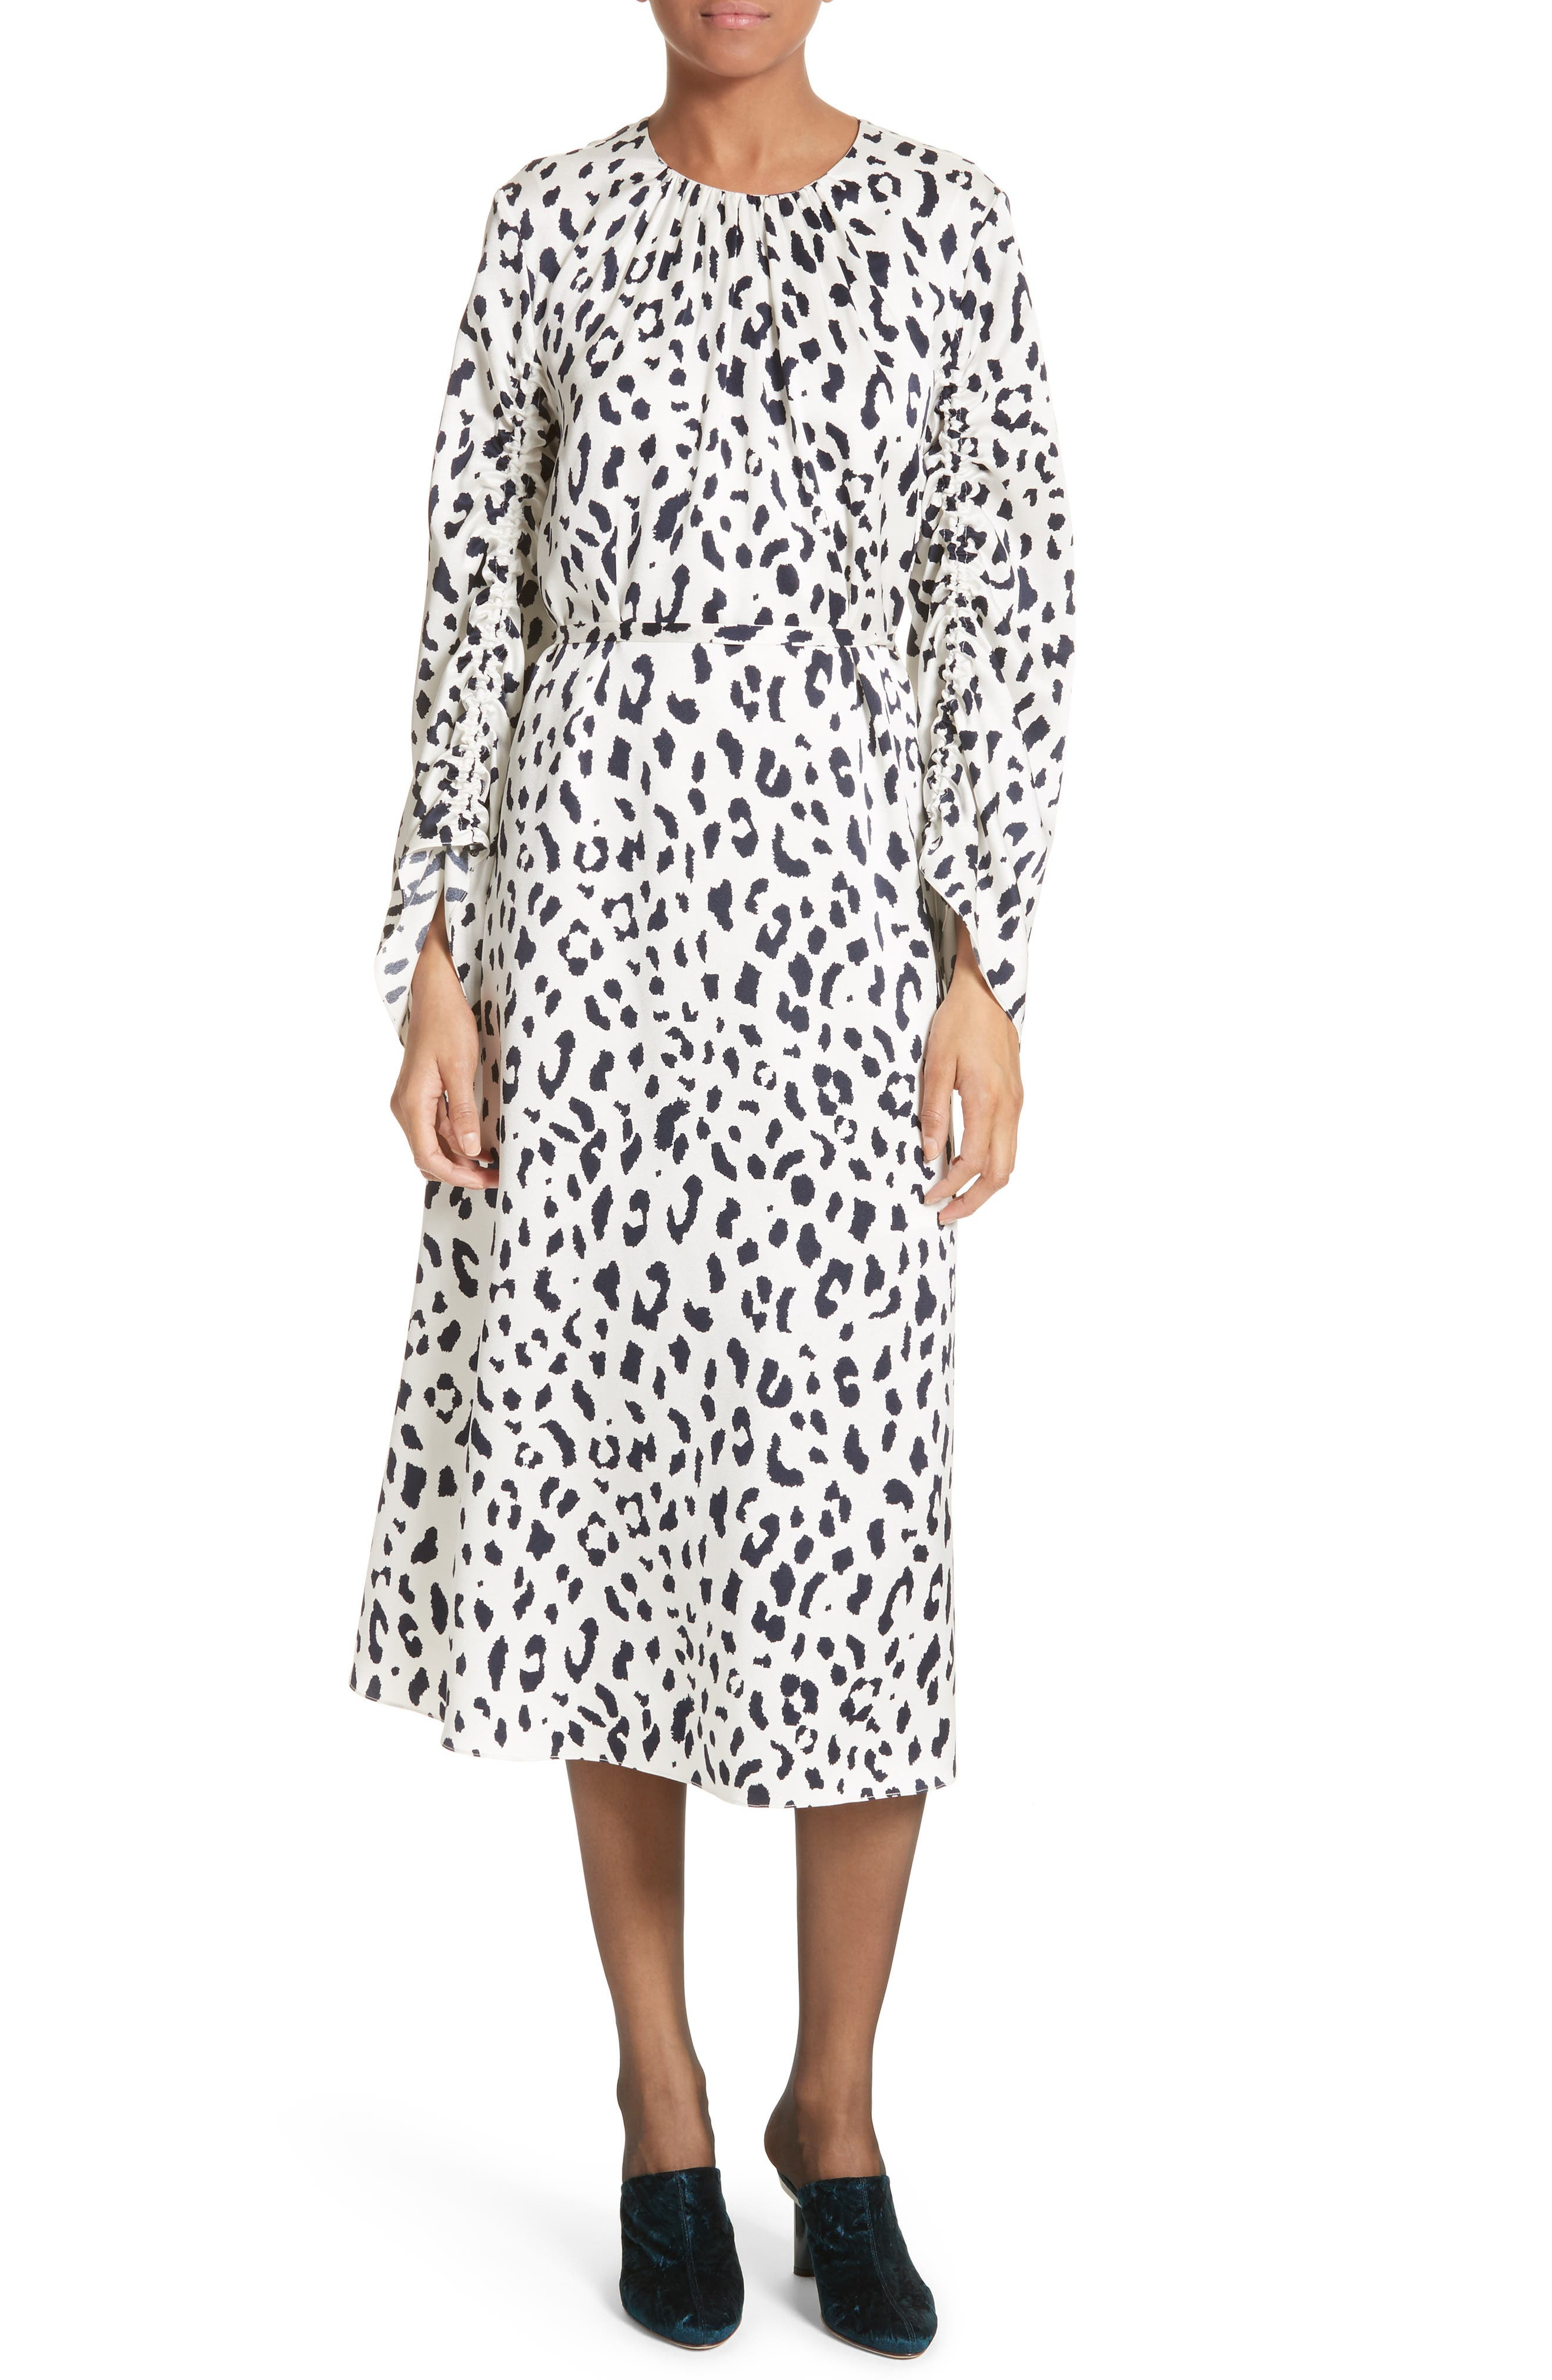 Tibi Cheetah Satin Dress